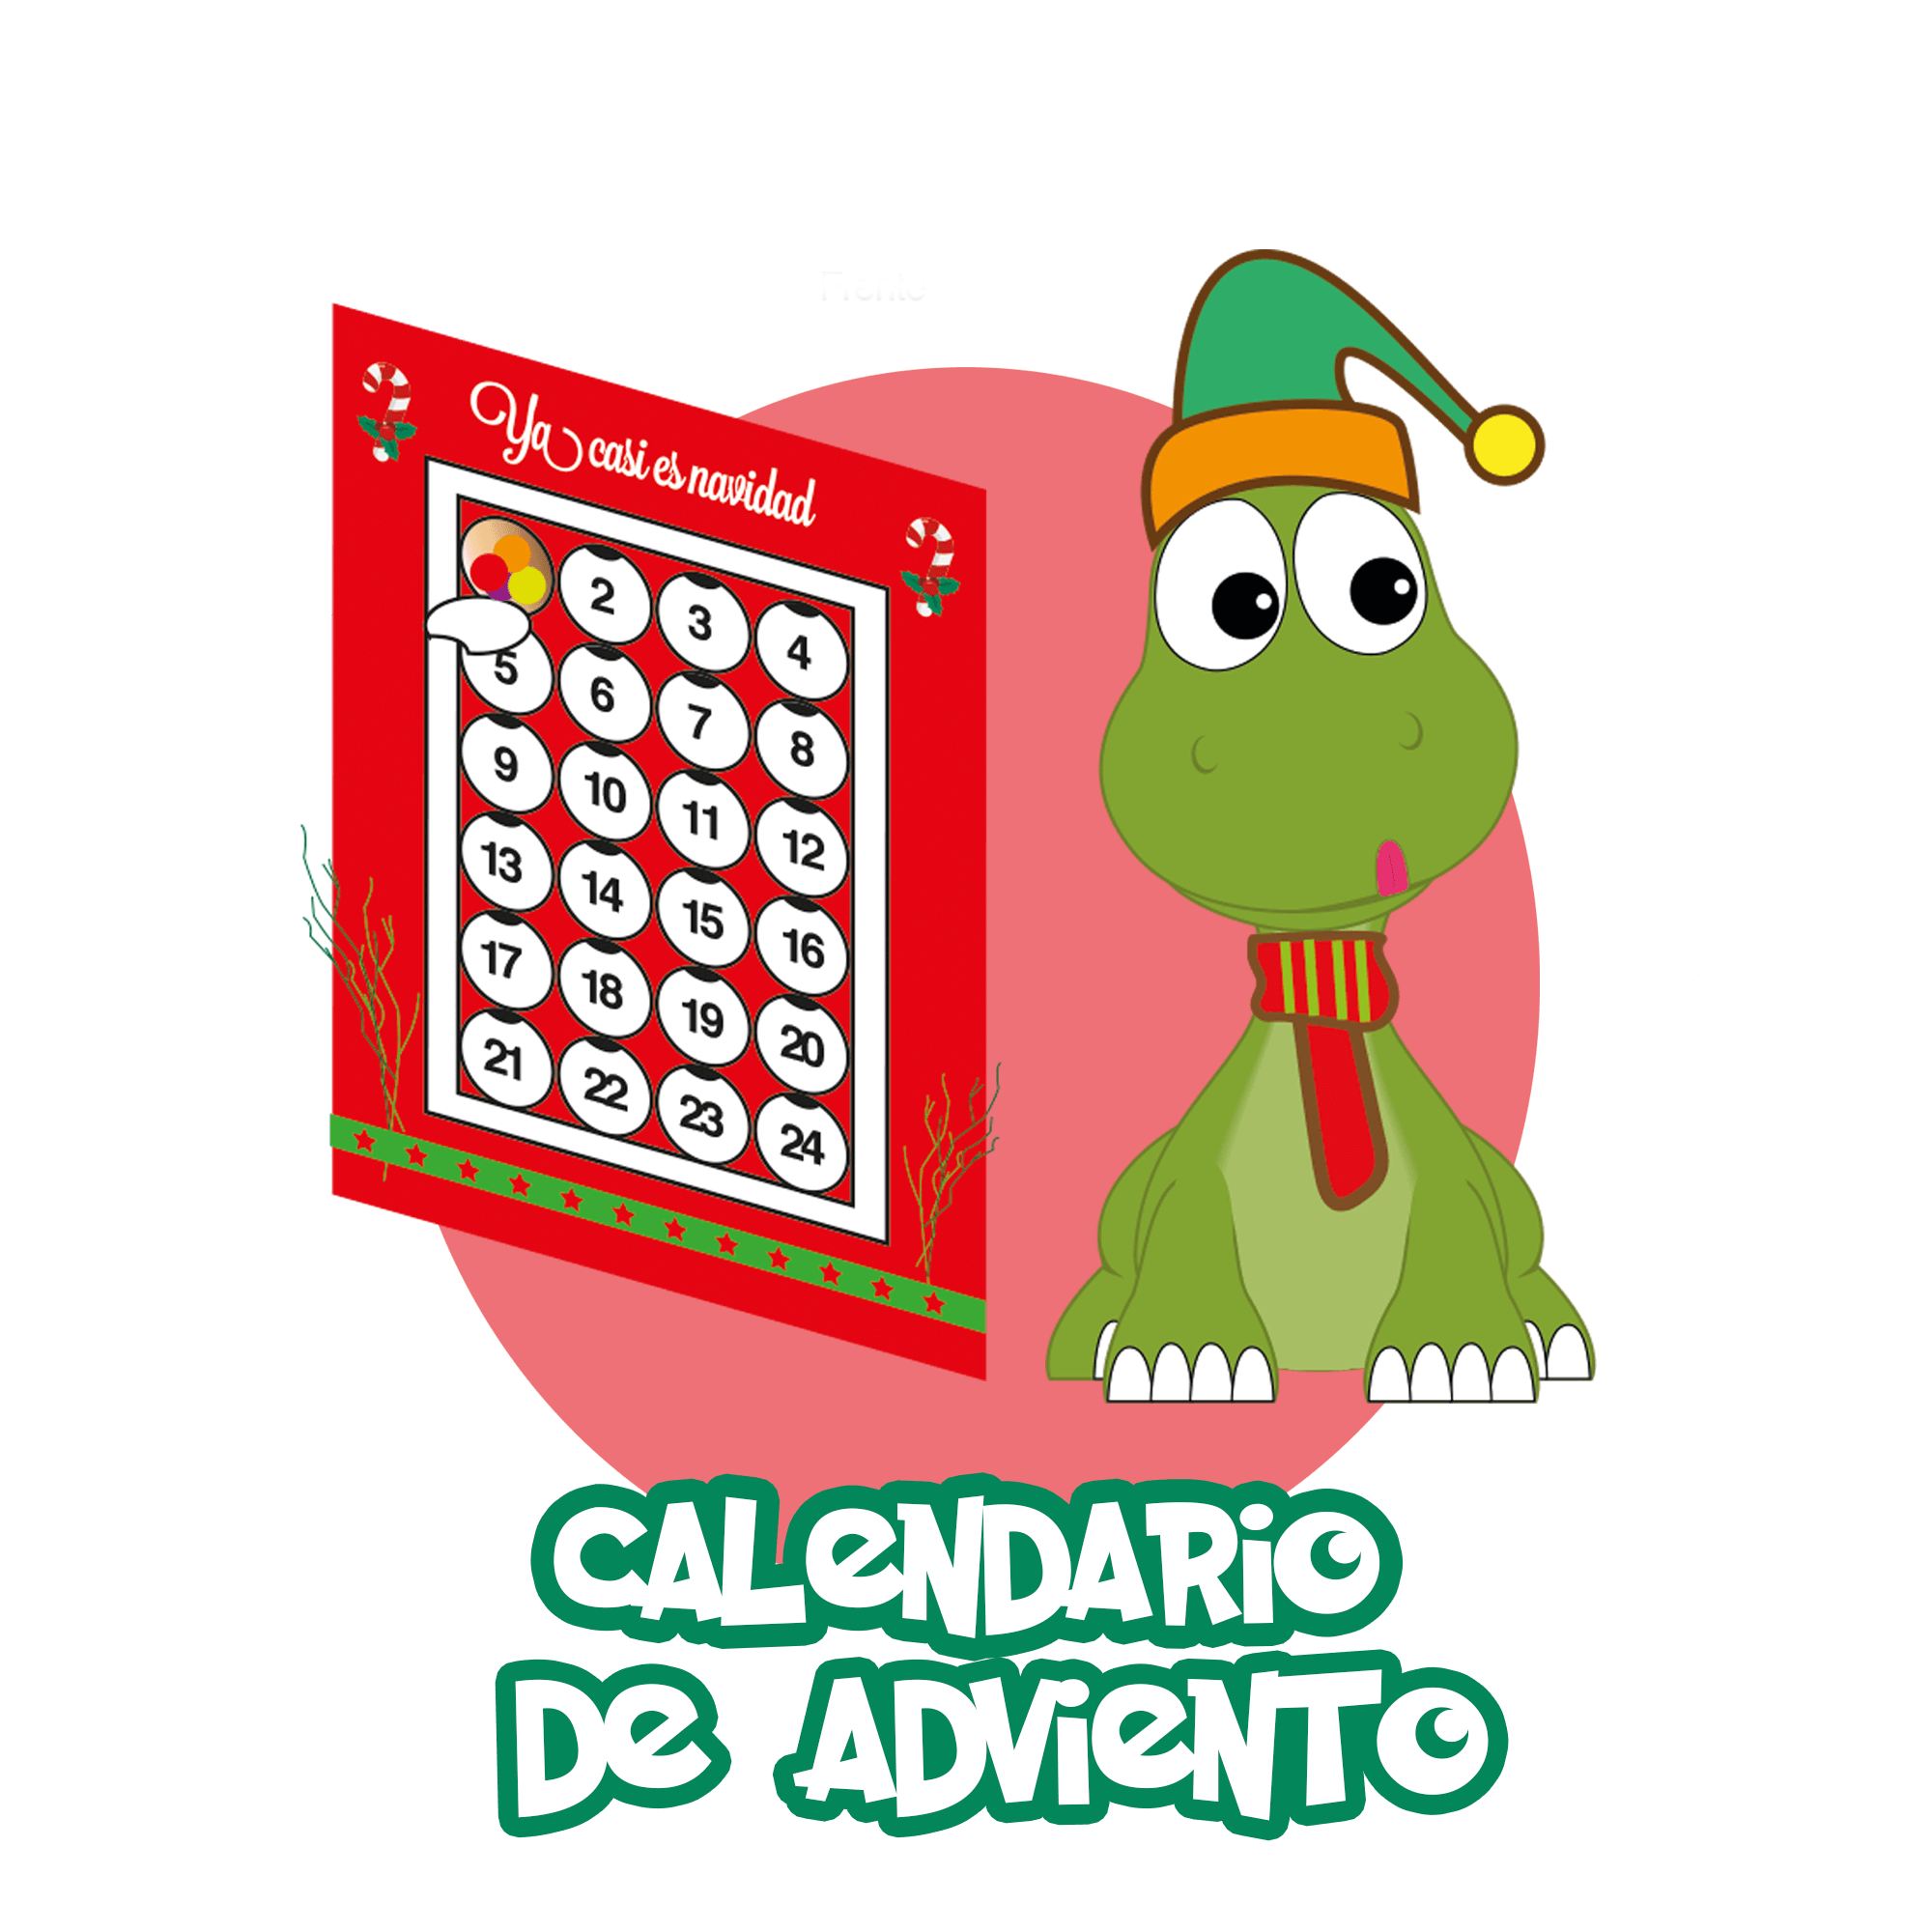 Calendario de Adviento de Docus